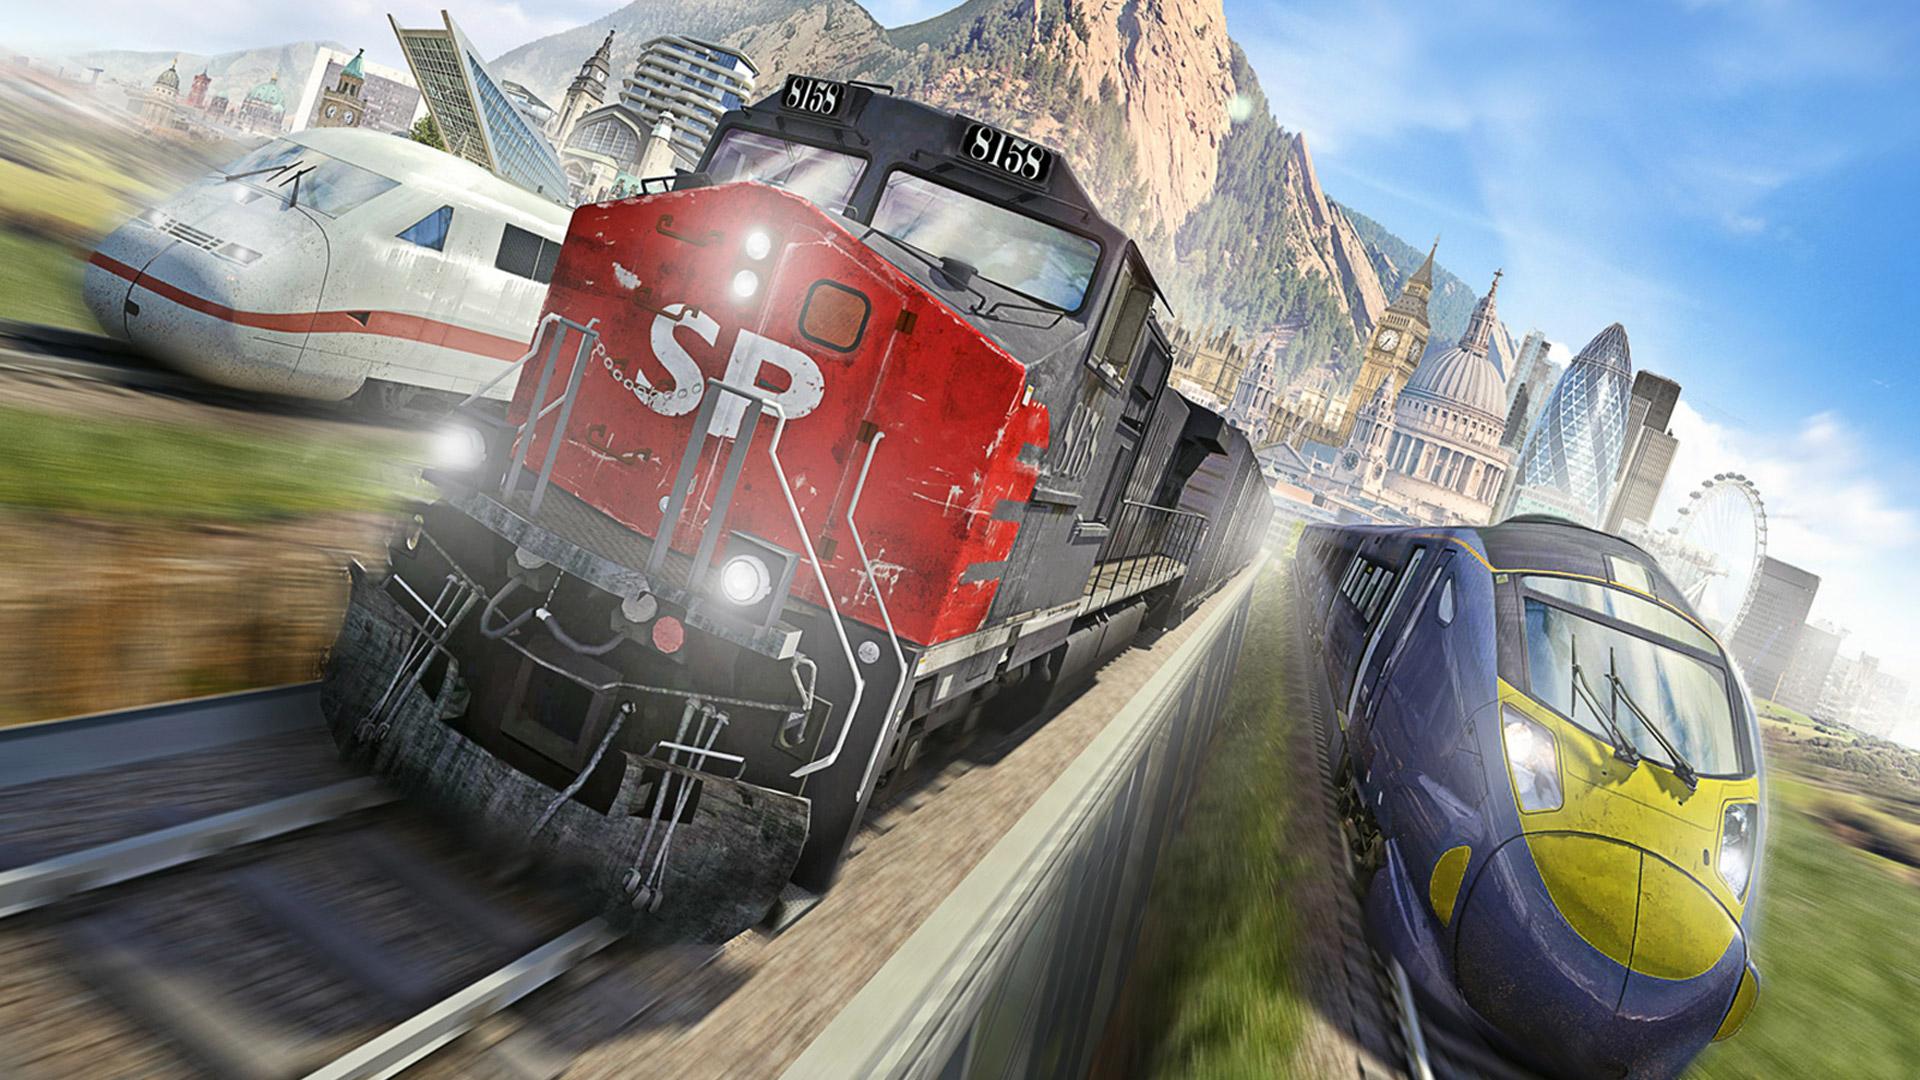 Free Train Simulator 2014 Wallpaper in 1920x1080